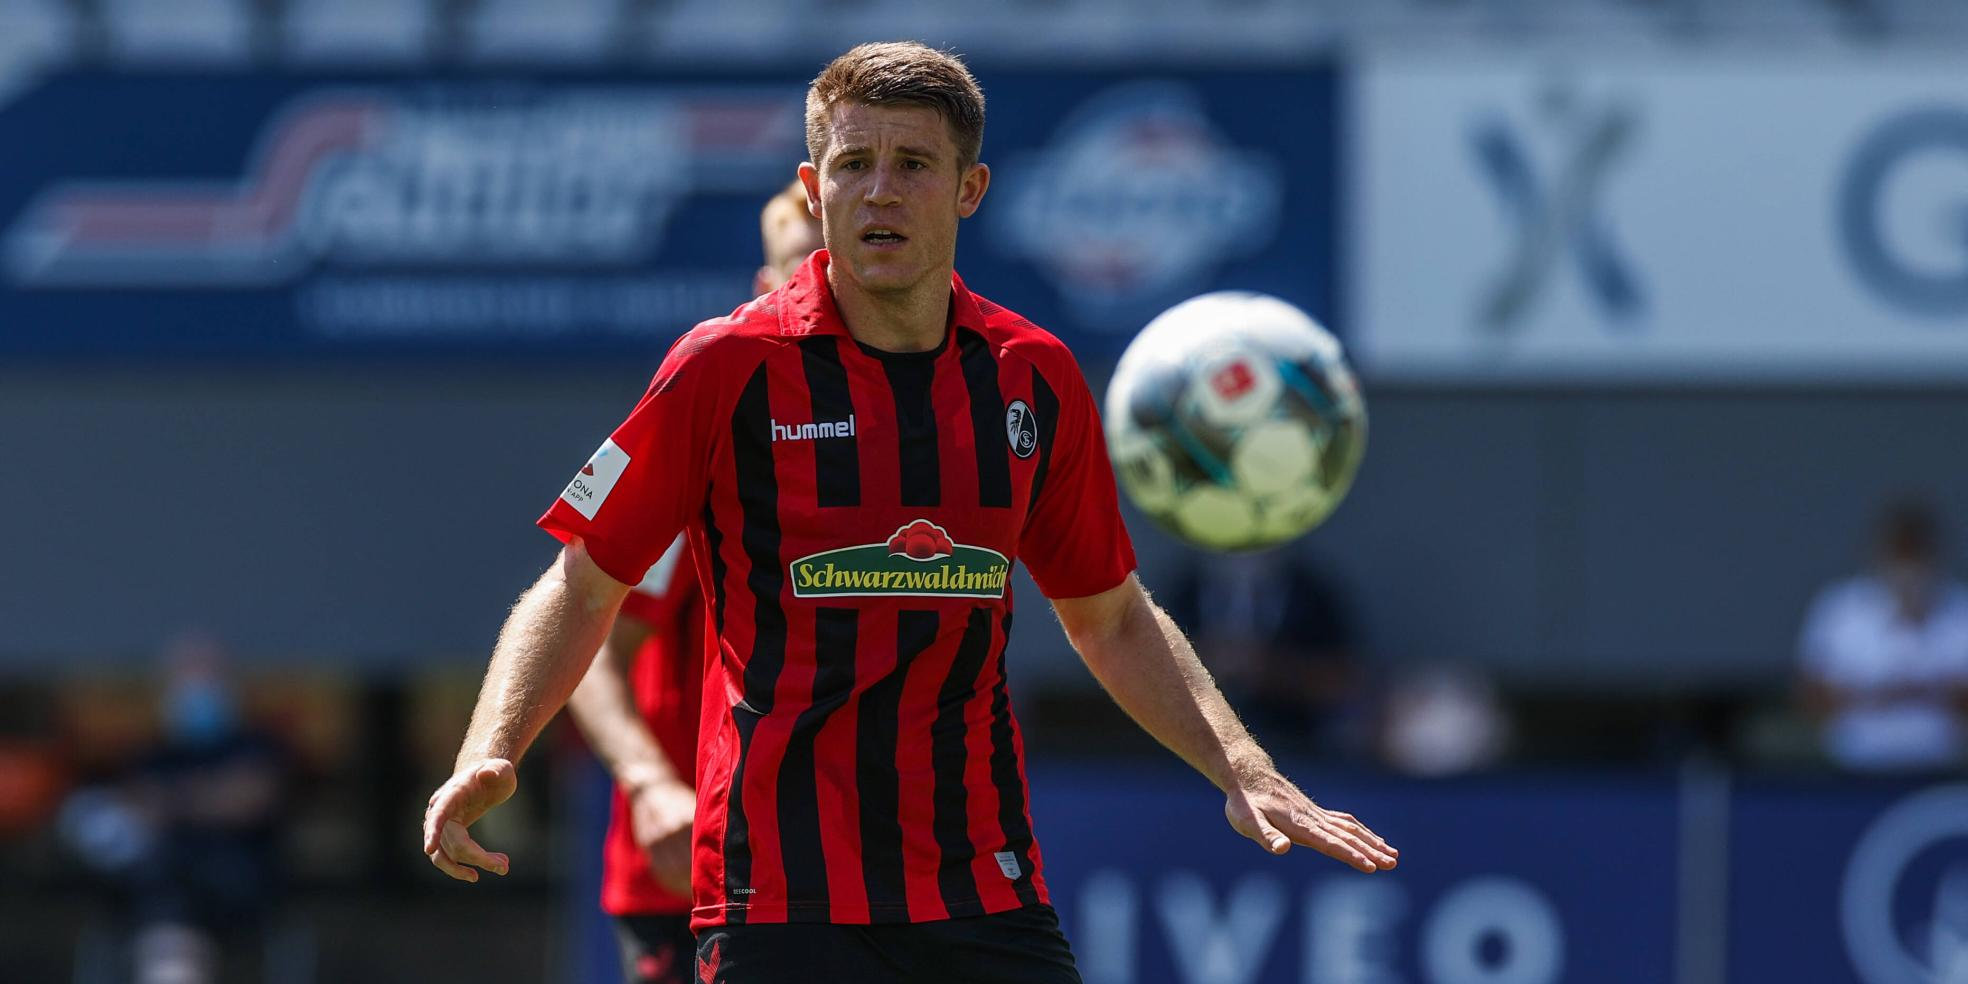 Dominique Heintz vom SC Freiburg